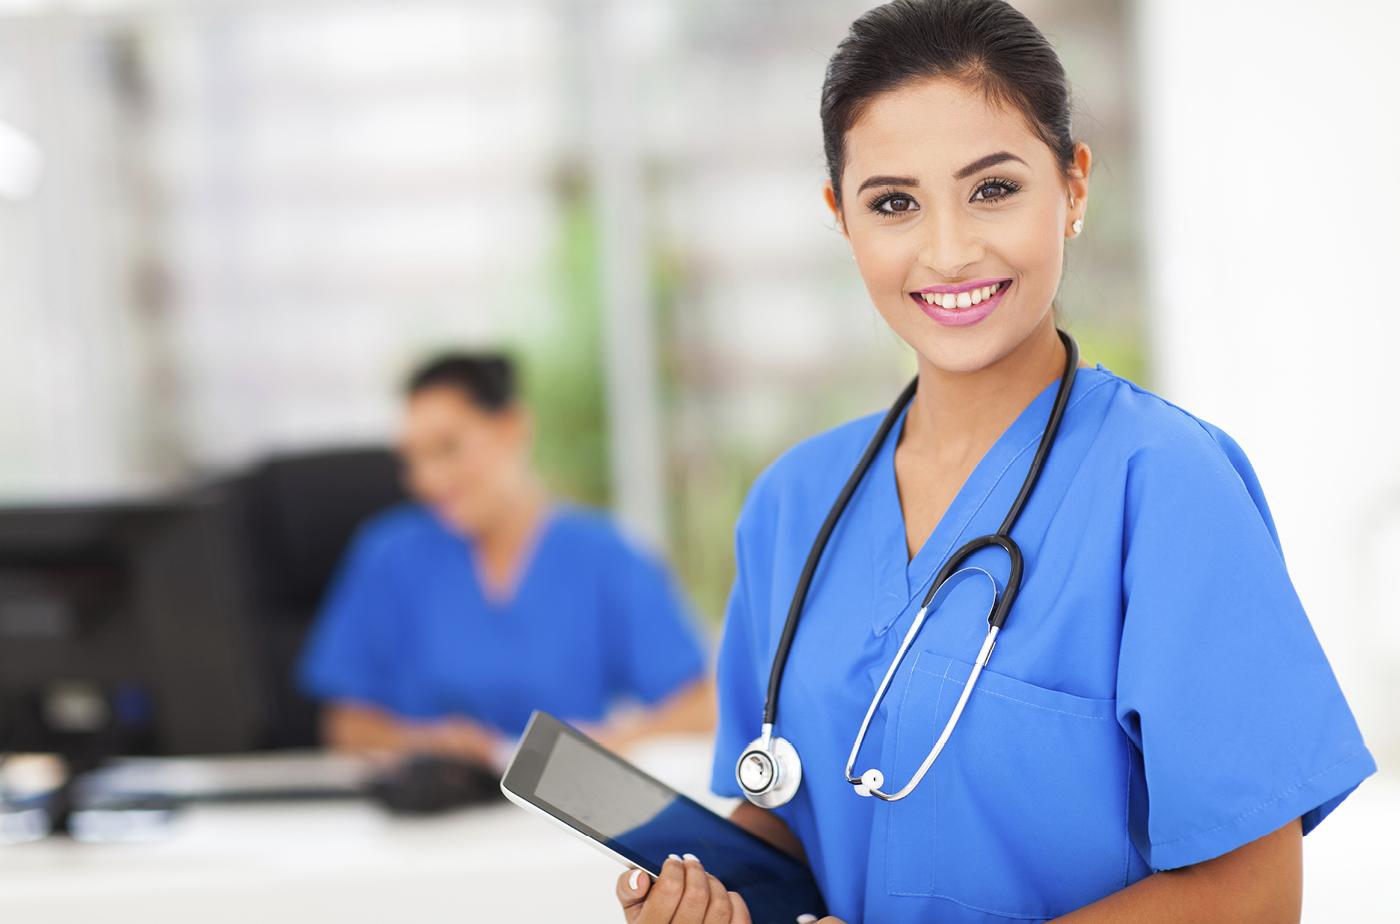 nursing practices